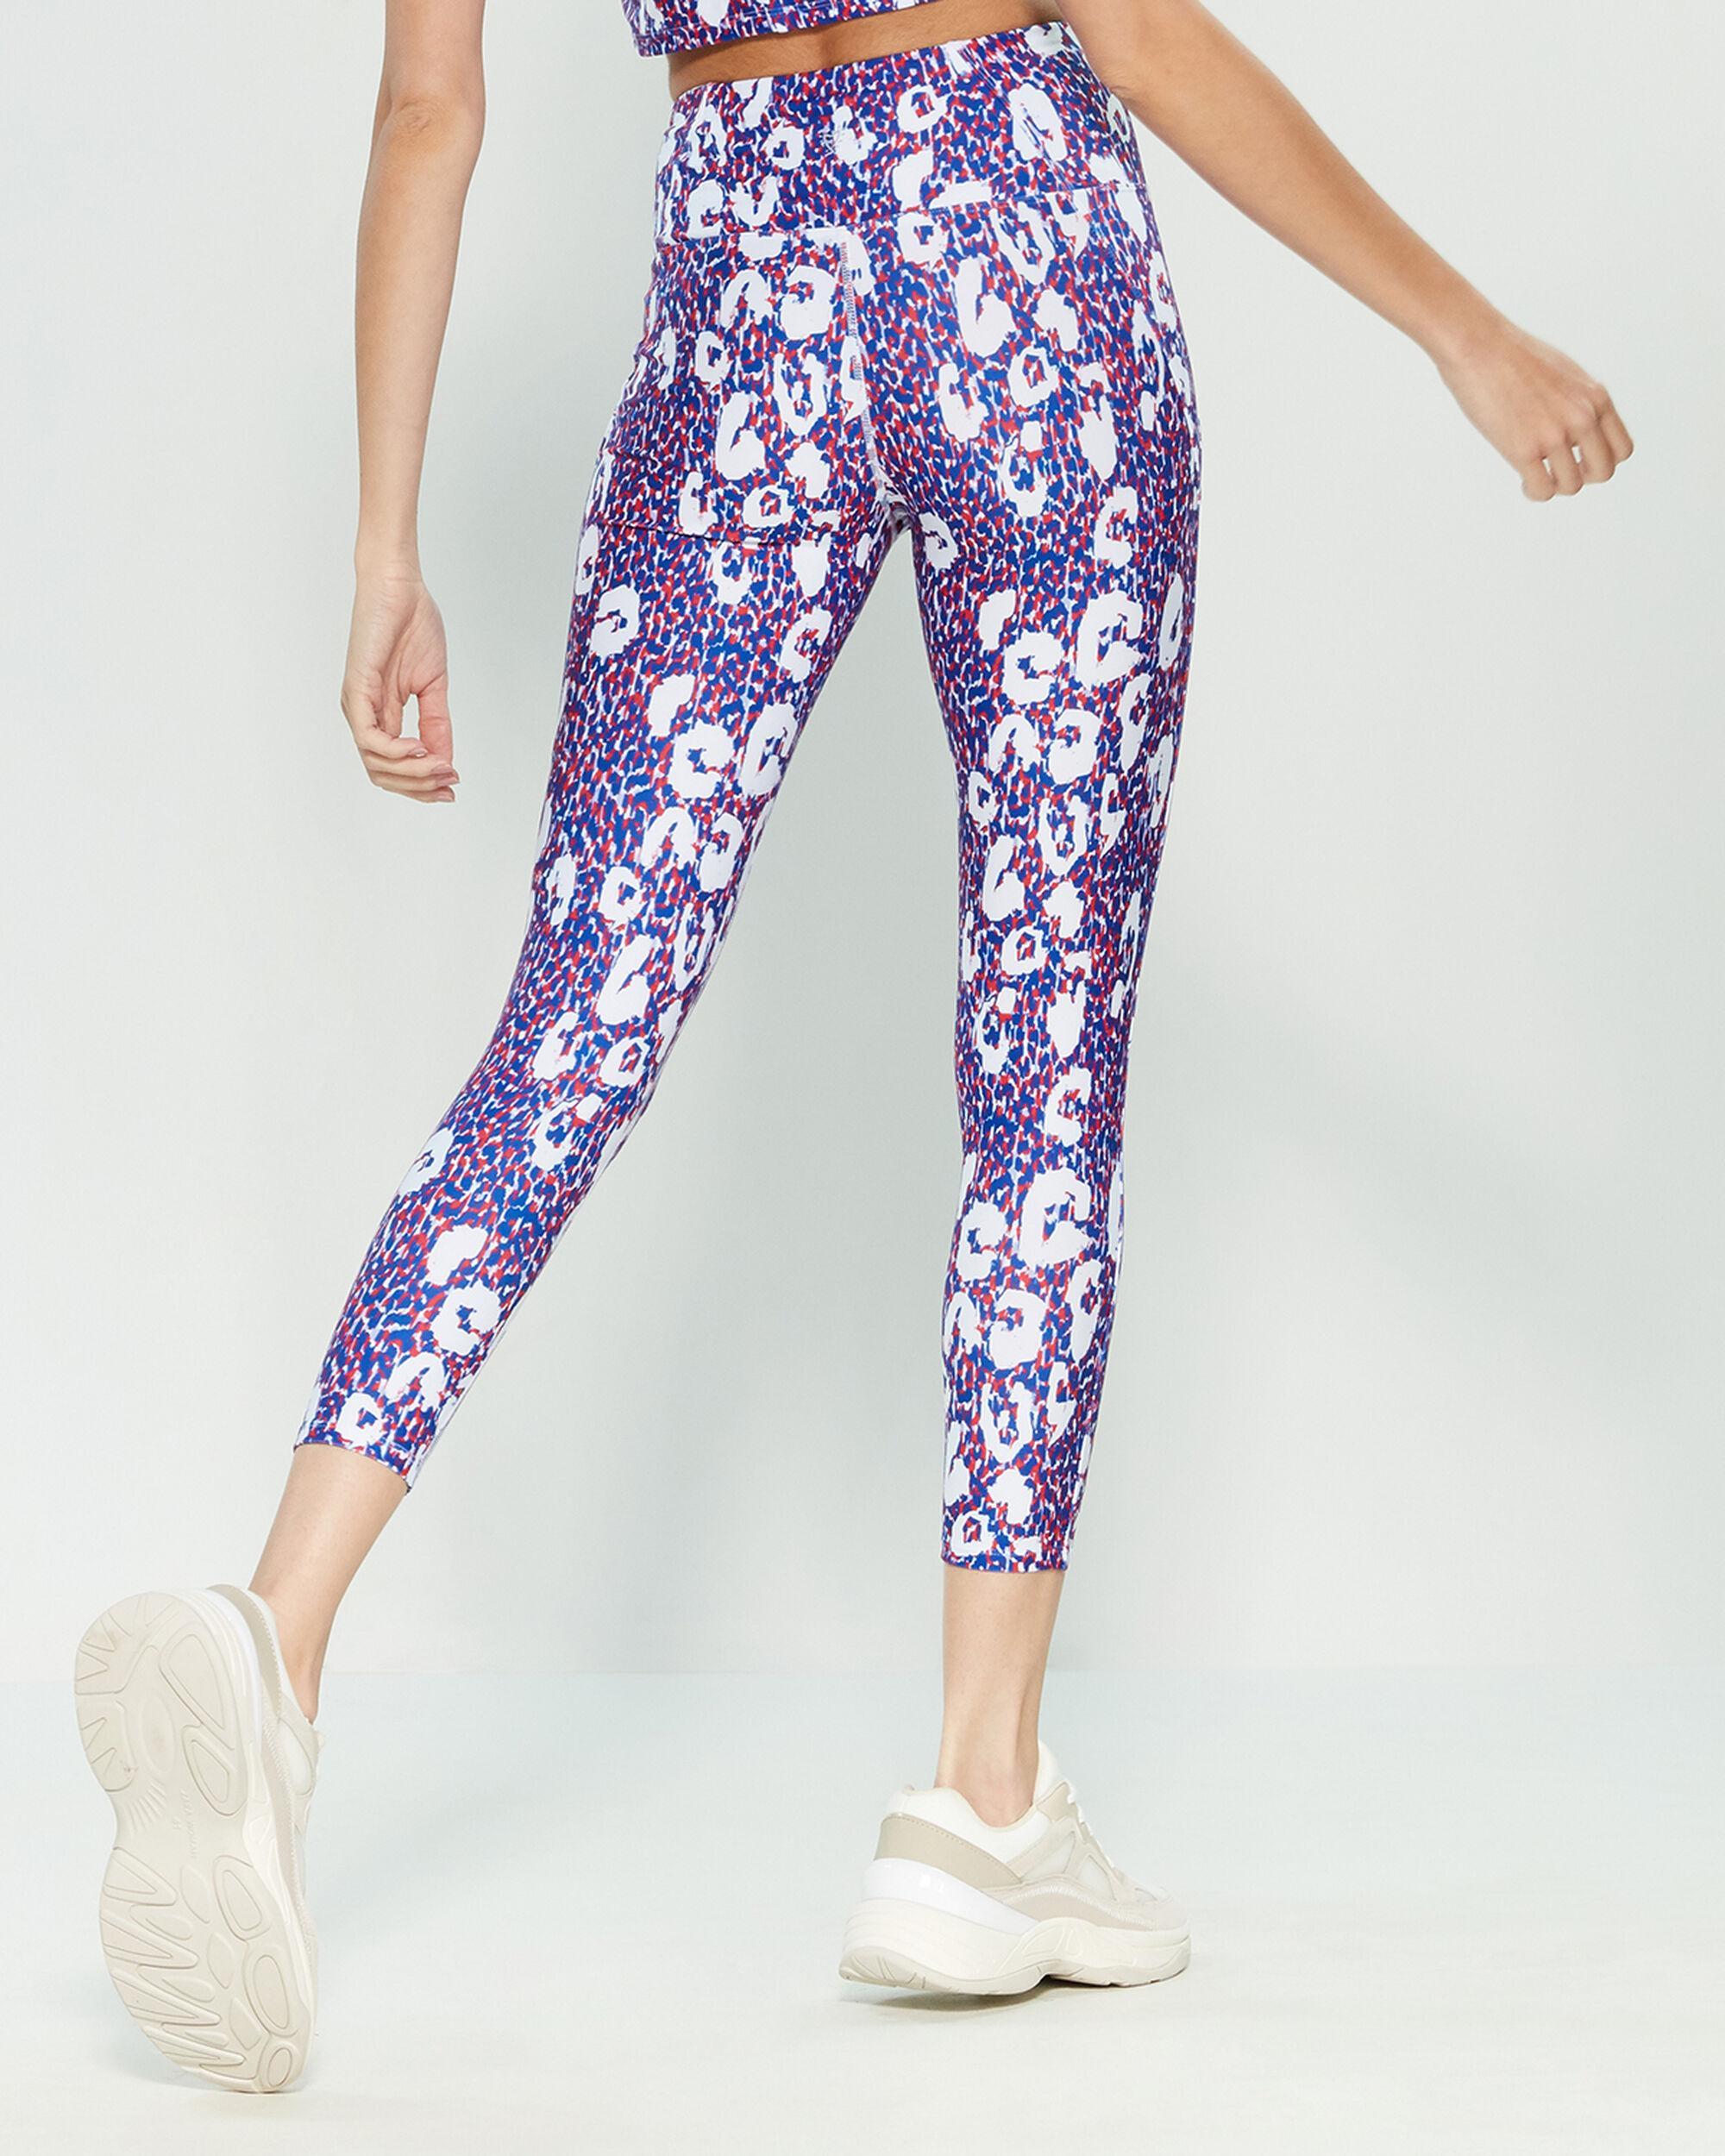 0c1dae319fe5 Betsey Johnson Speckled Leopard Leggings in Purple - Lyst